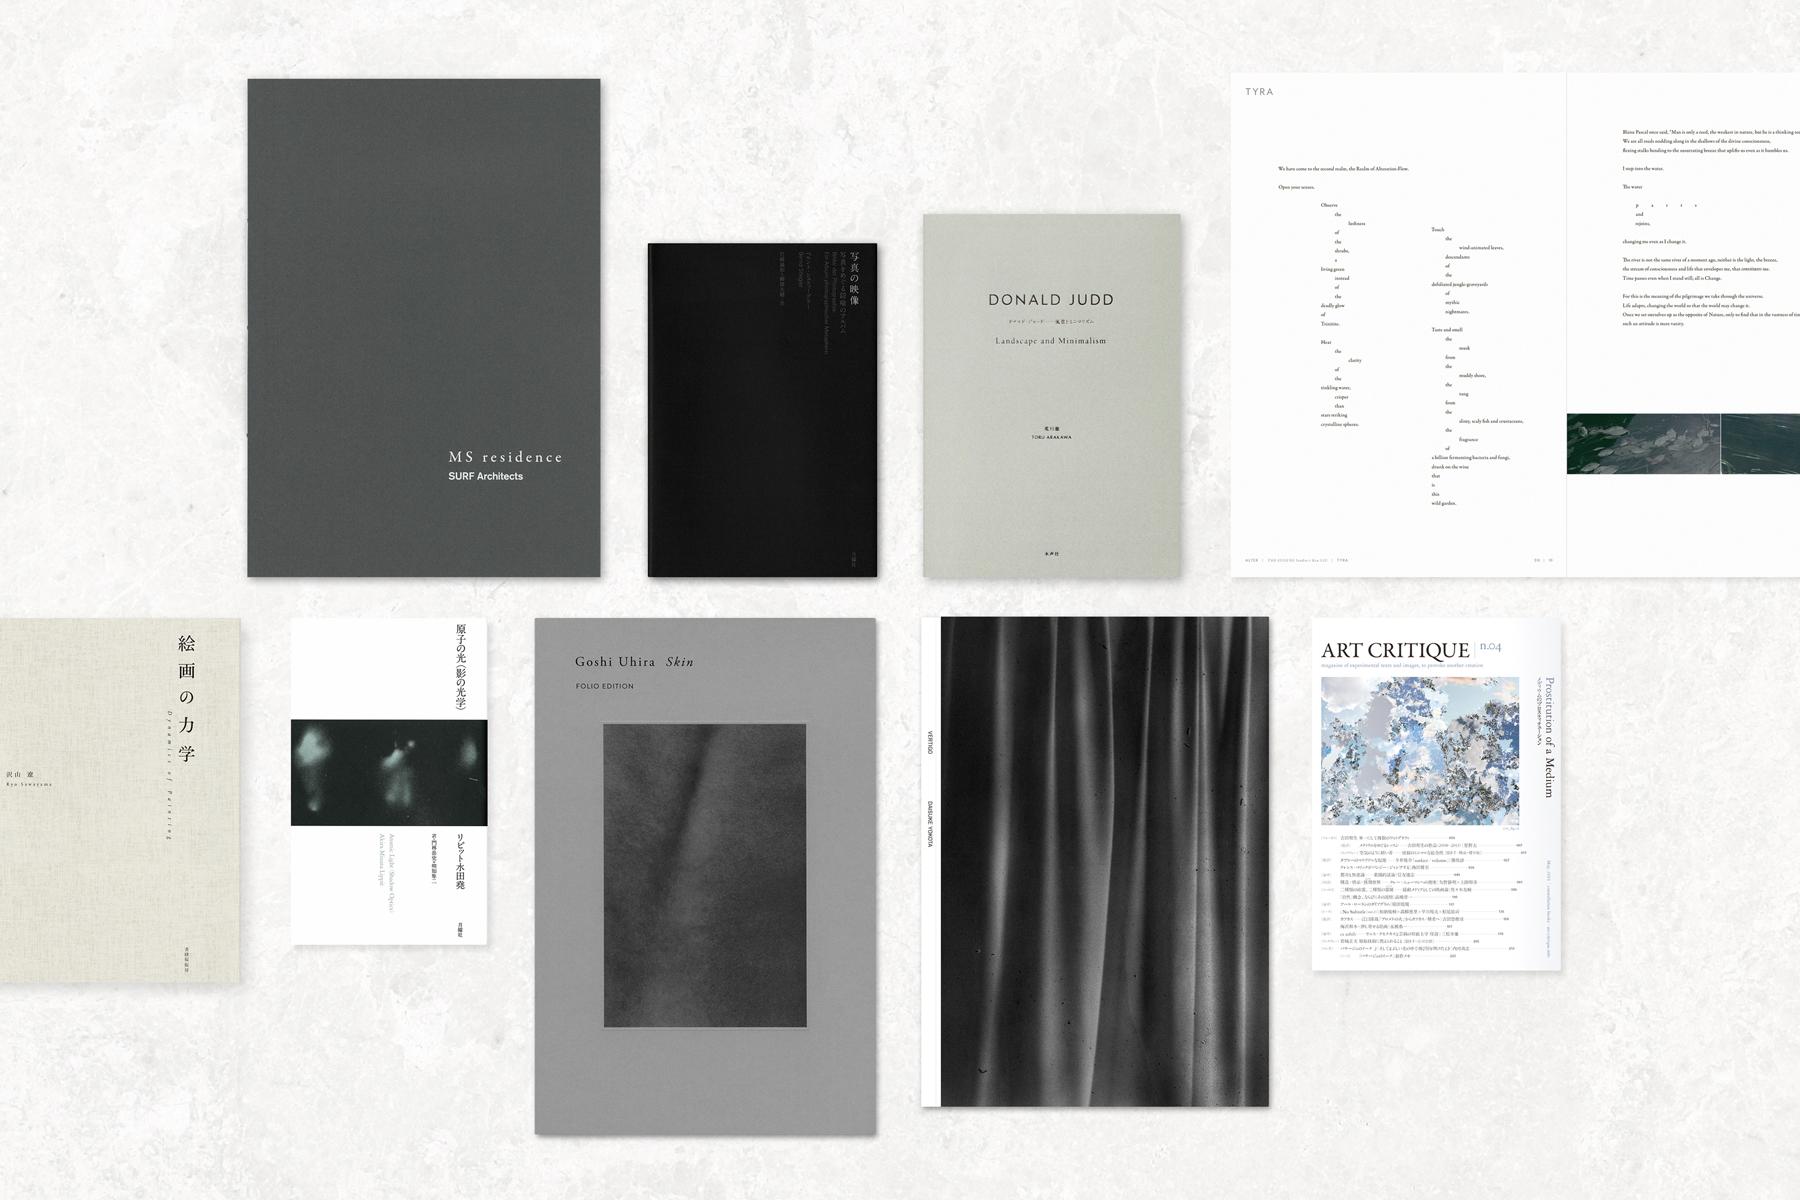 01_Goshi-Uhira_Breathing-Books_20200922_W1800